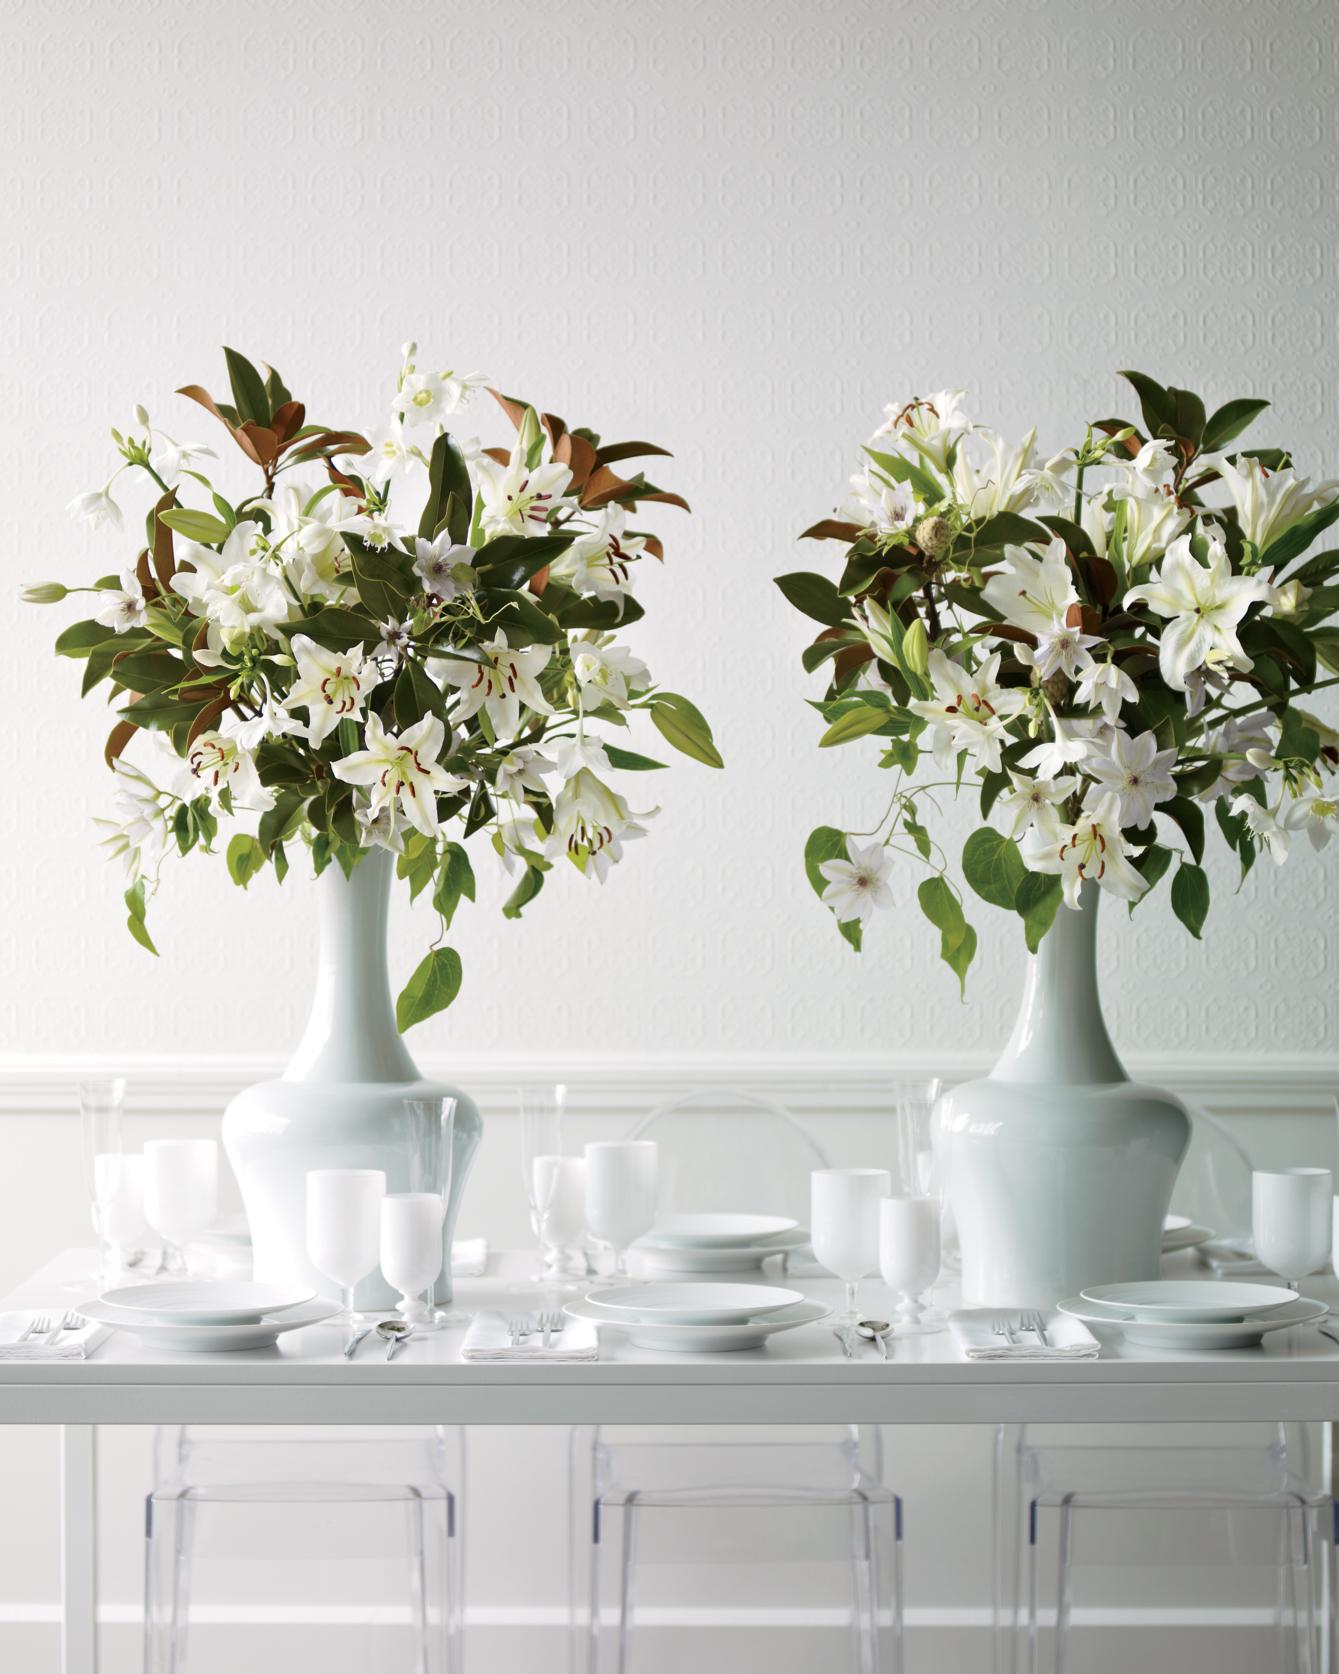 bouquet-tall-vase-mwd107875.jpg